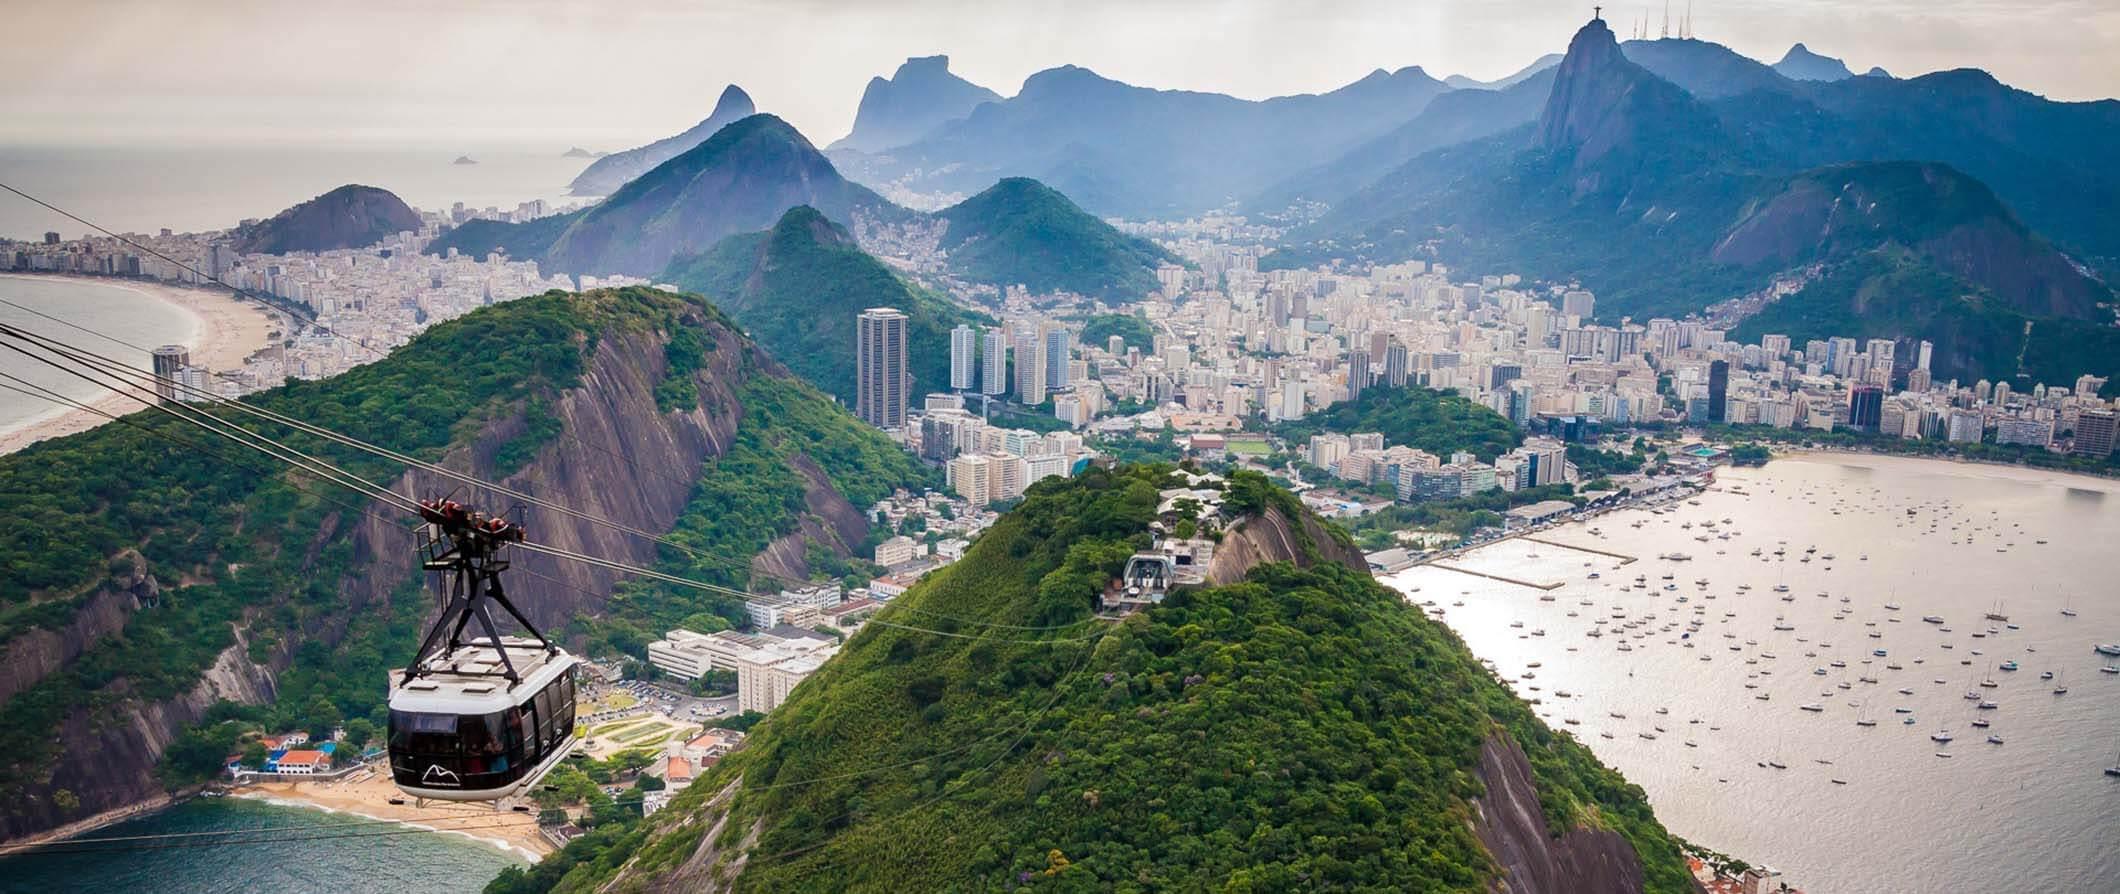 Cheap Insurance Companies >> Rio de Janeiro Travel Guide